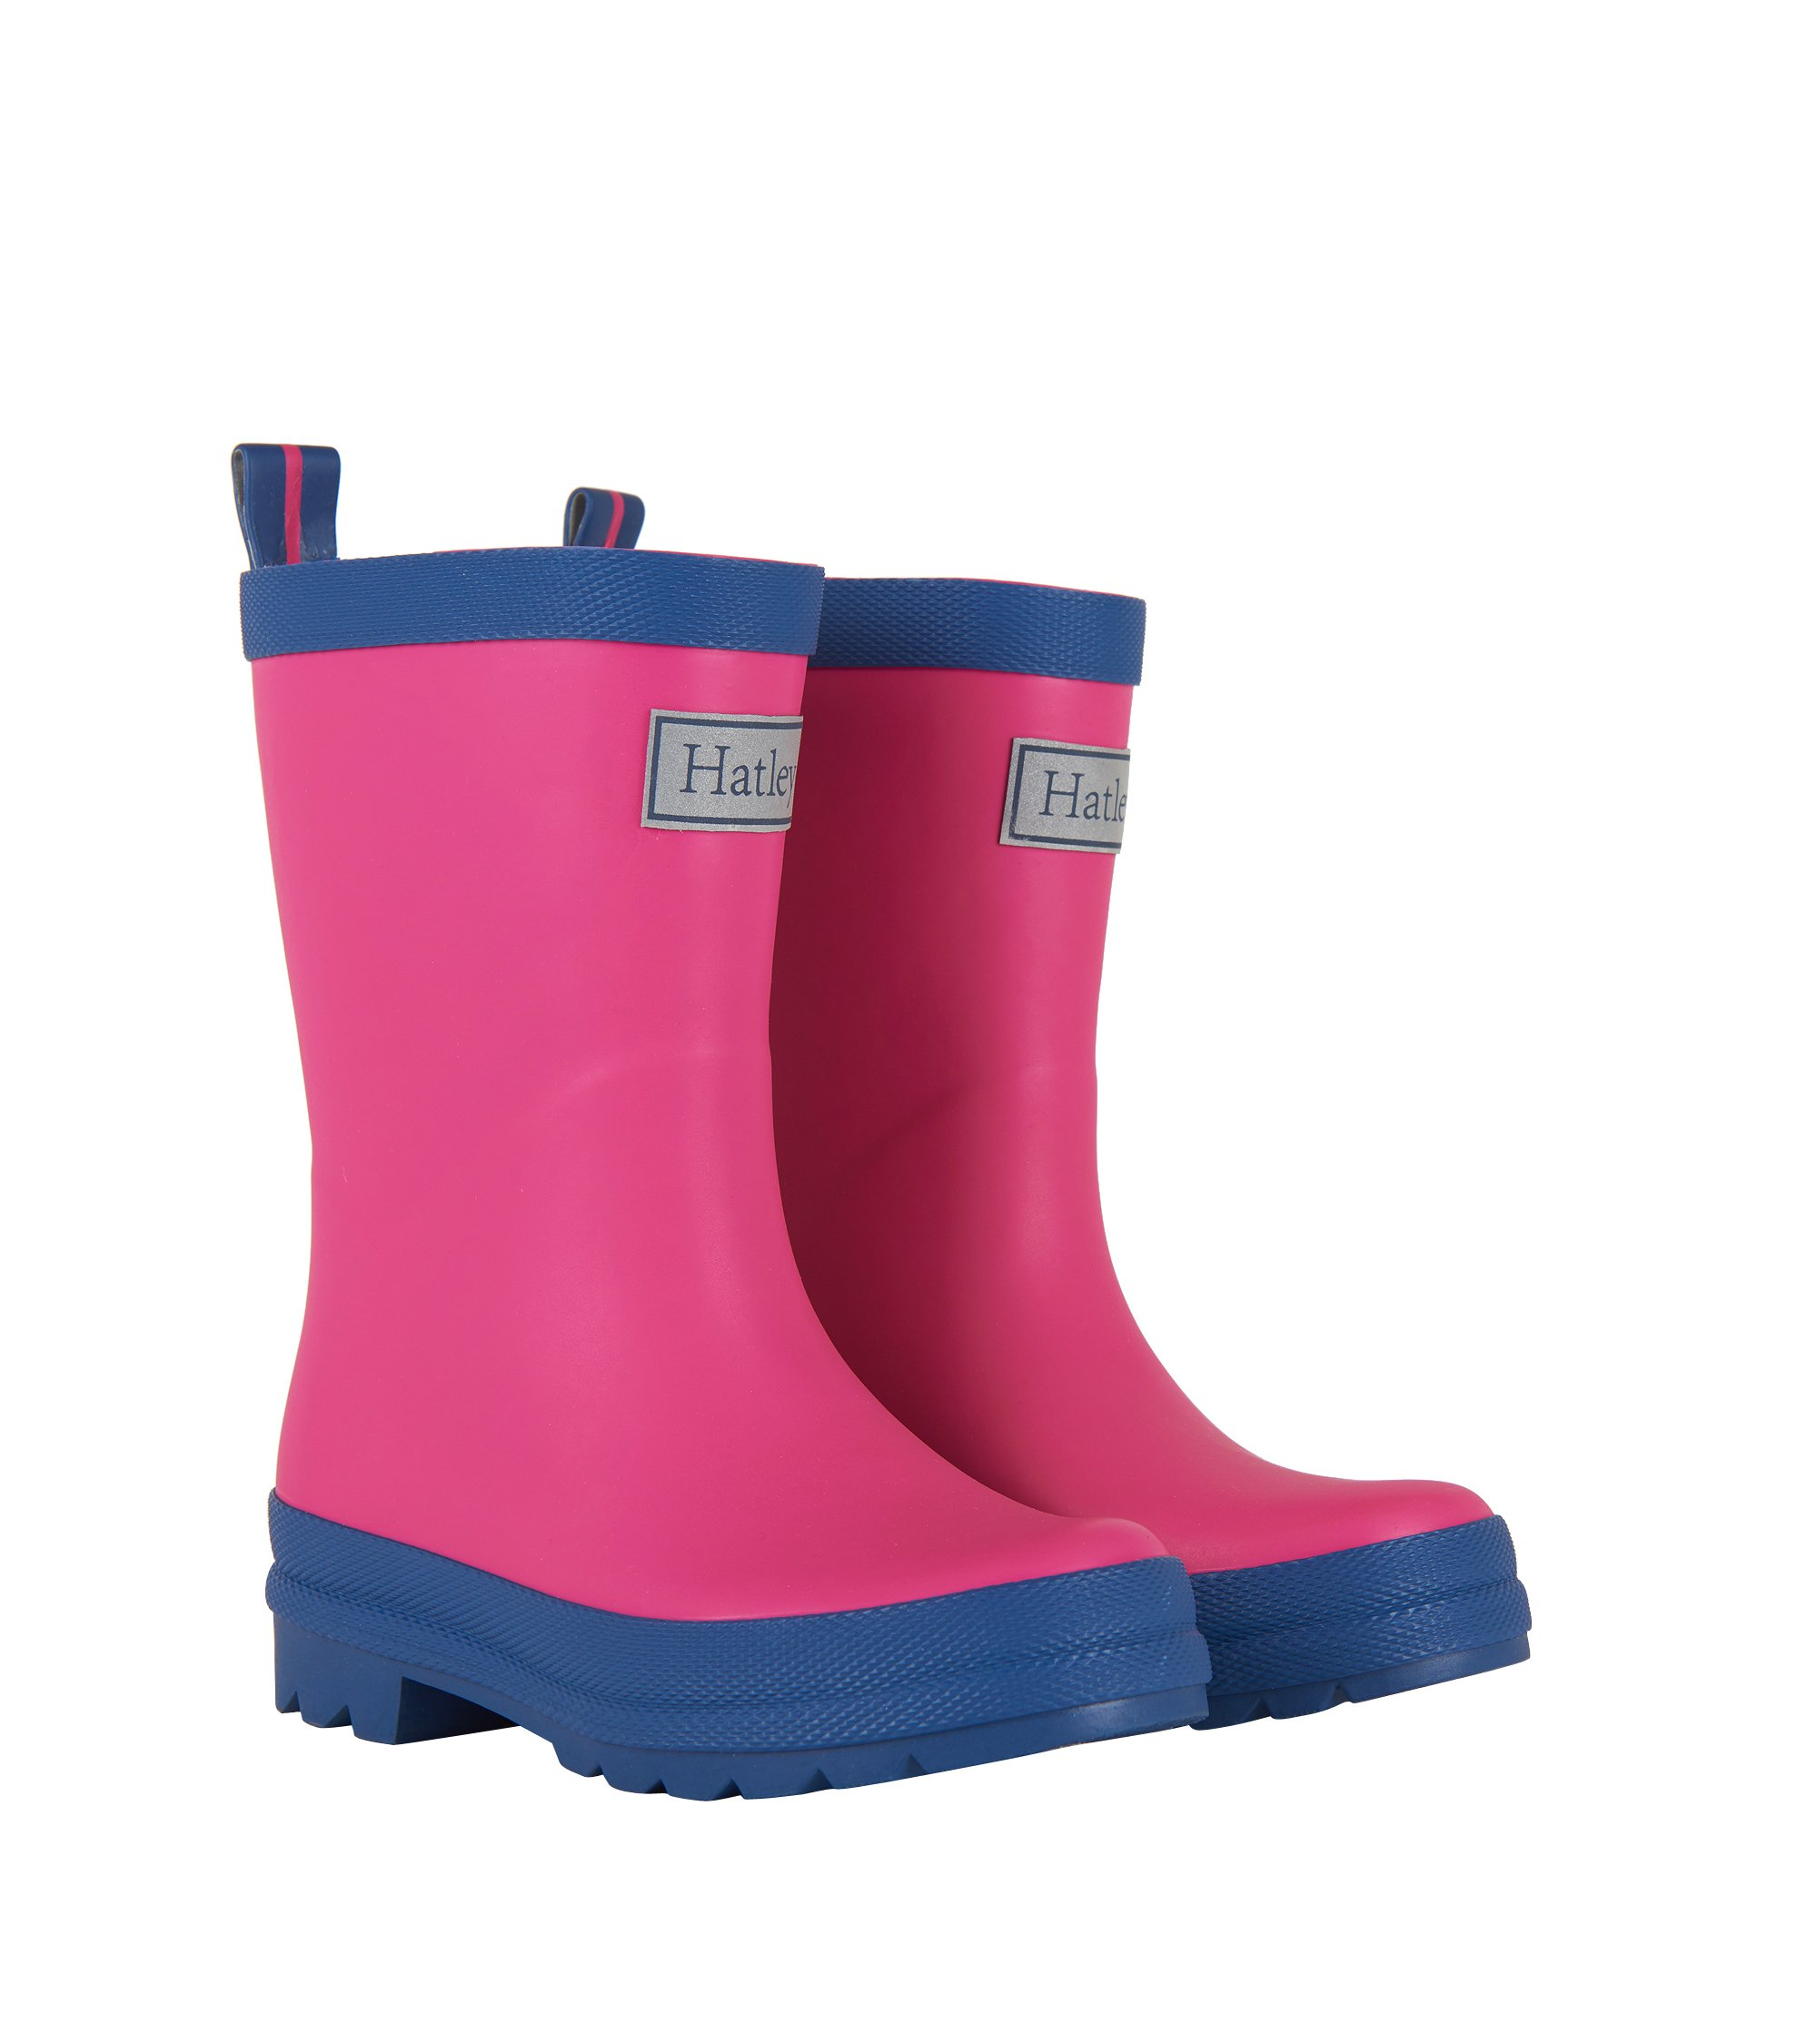 Hatley Classic Boots Girls Rain Accessory, Fuchsia and Navy, 10 M US Little Kid